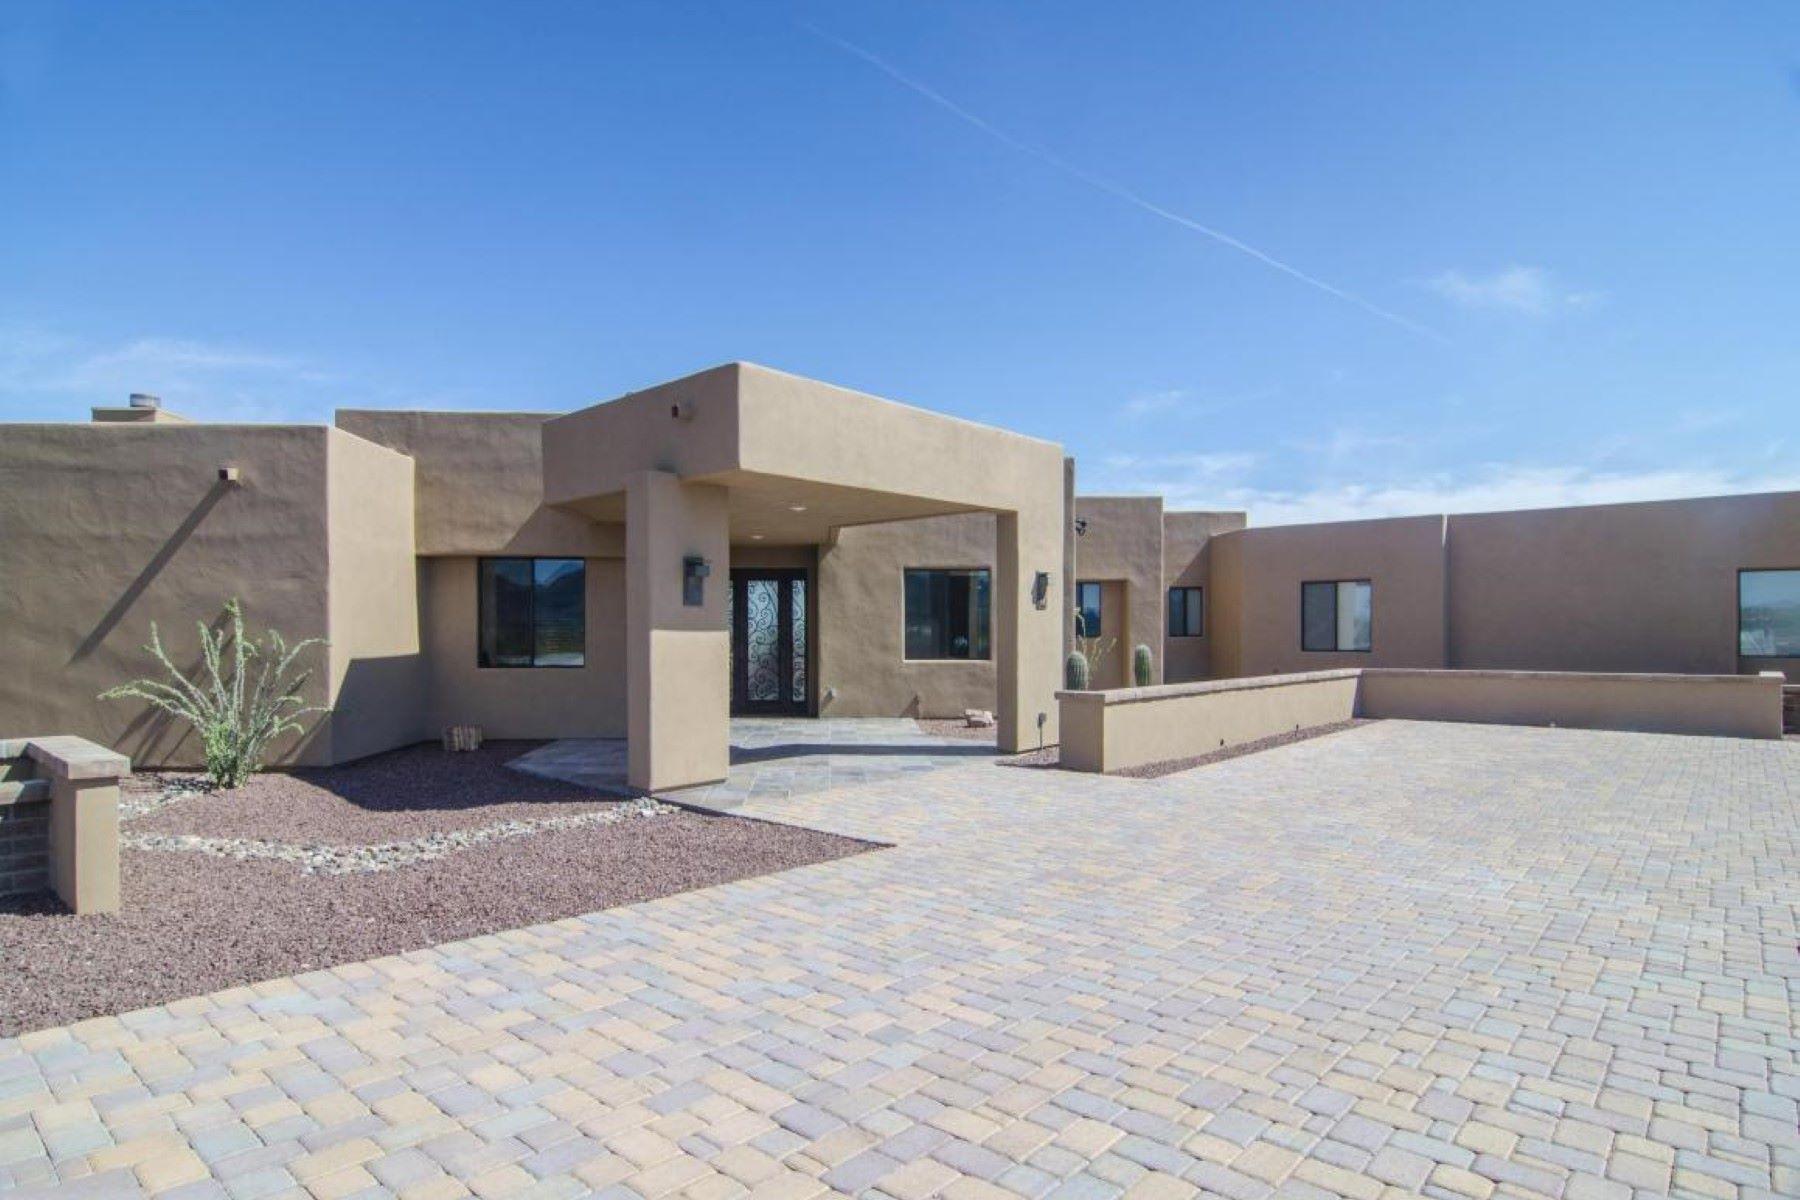 独户住宅 为 销售 在 Absolutely breathtaking Westside Rio Rico home 1249 Calle Cherokee 里约, 亚利桑那州, 85648 美国